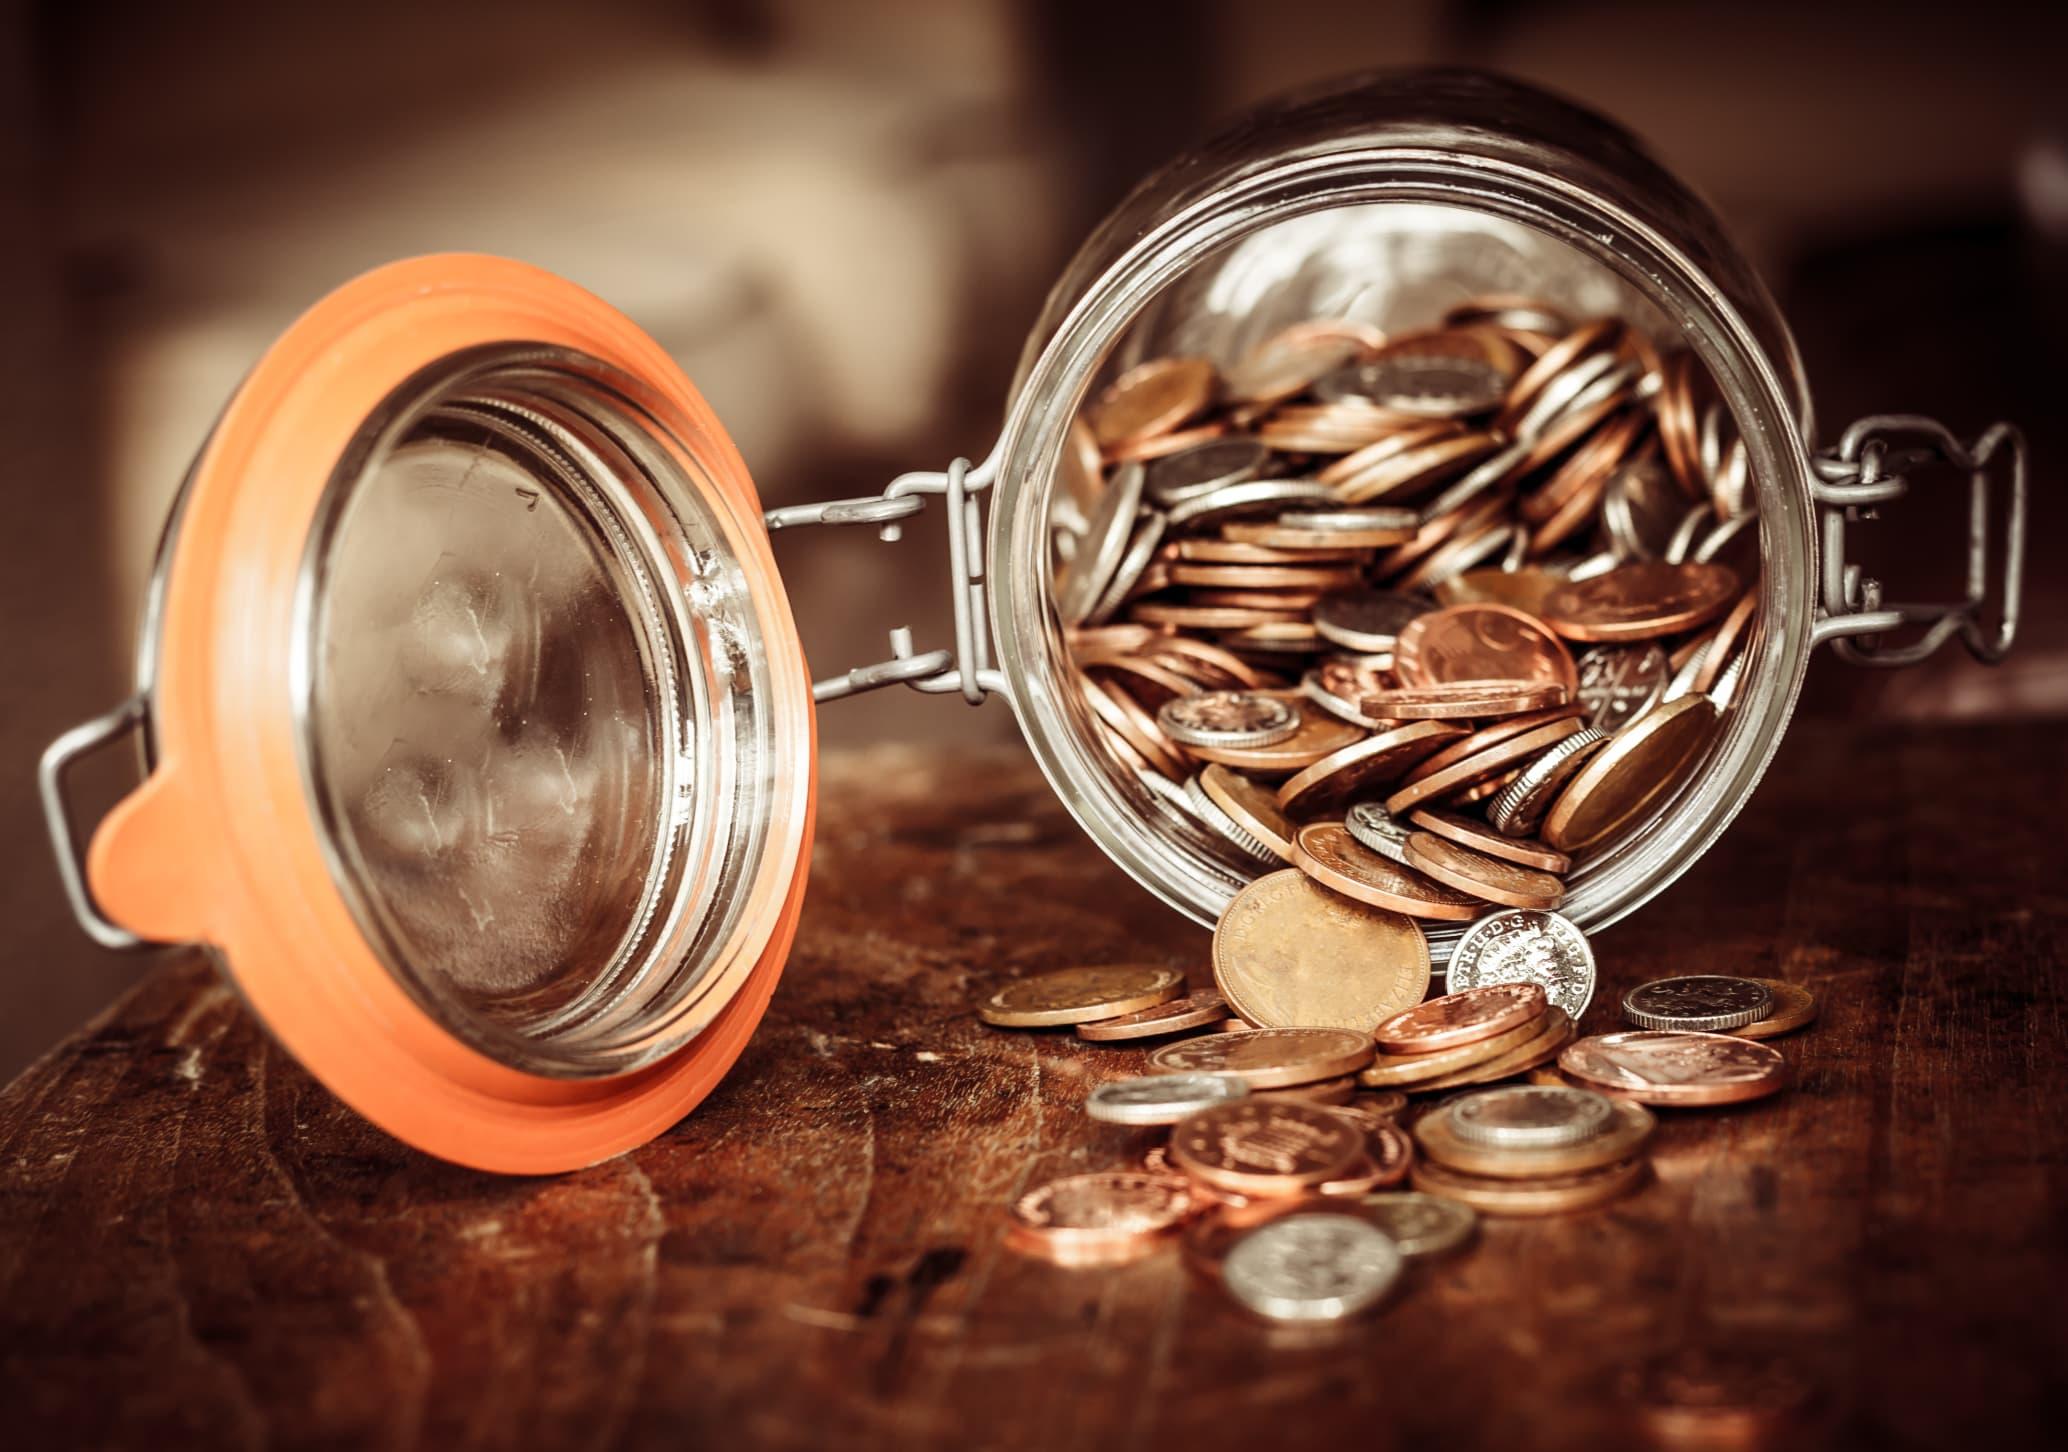 TD Bank to customers: 'Keep the change'